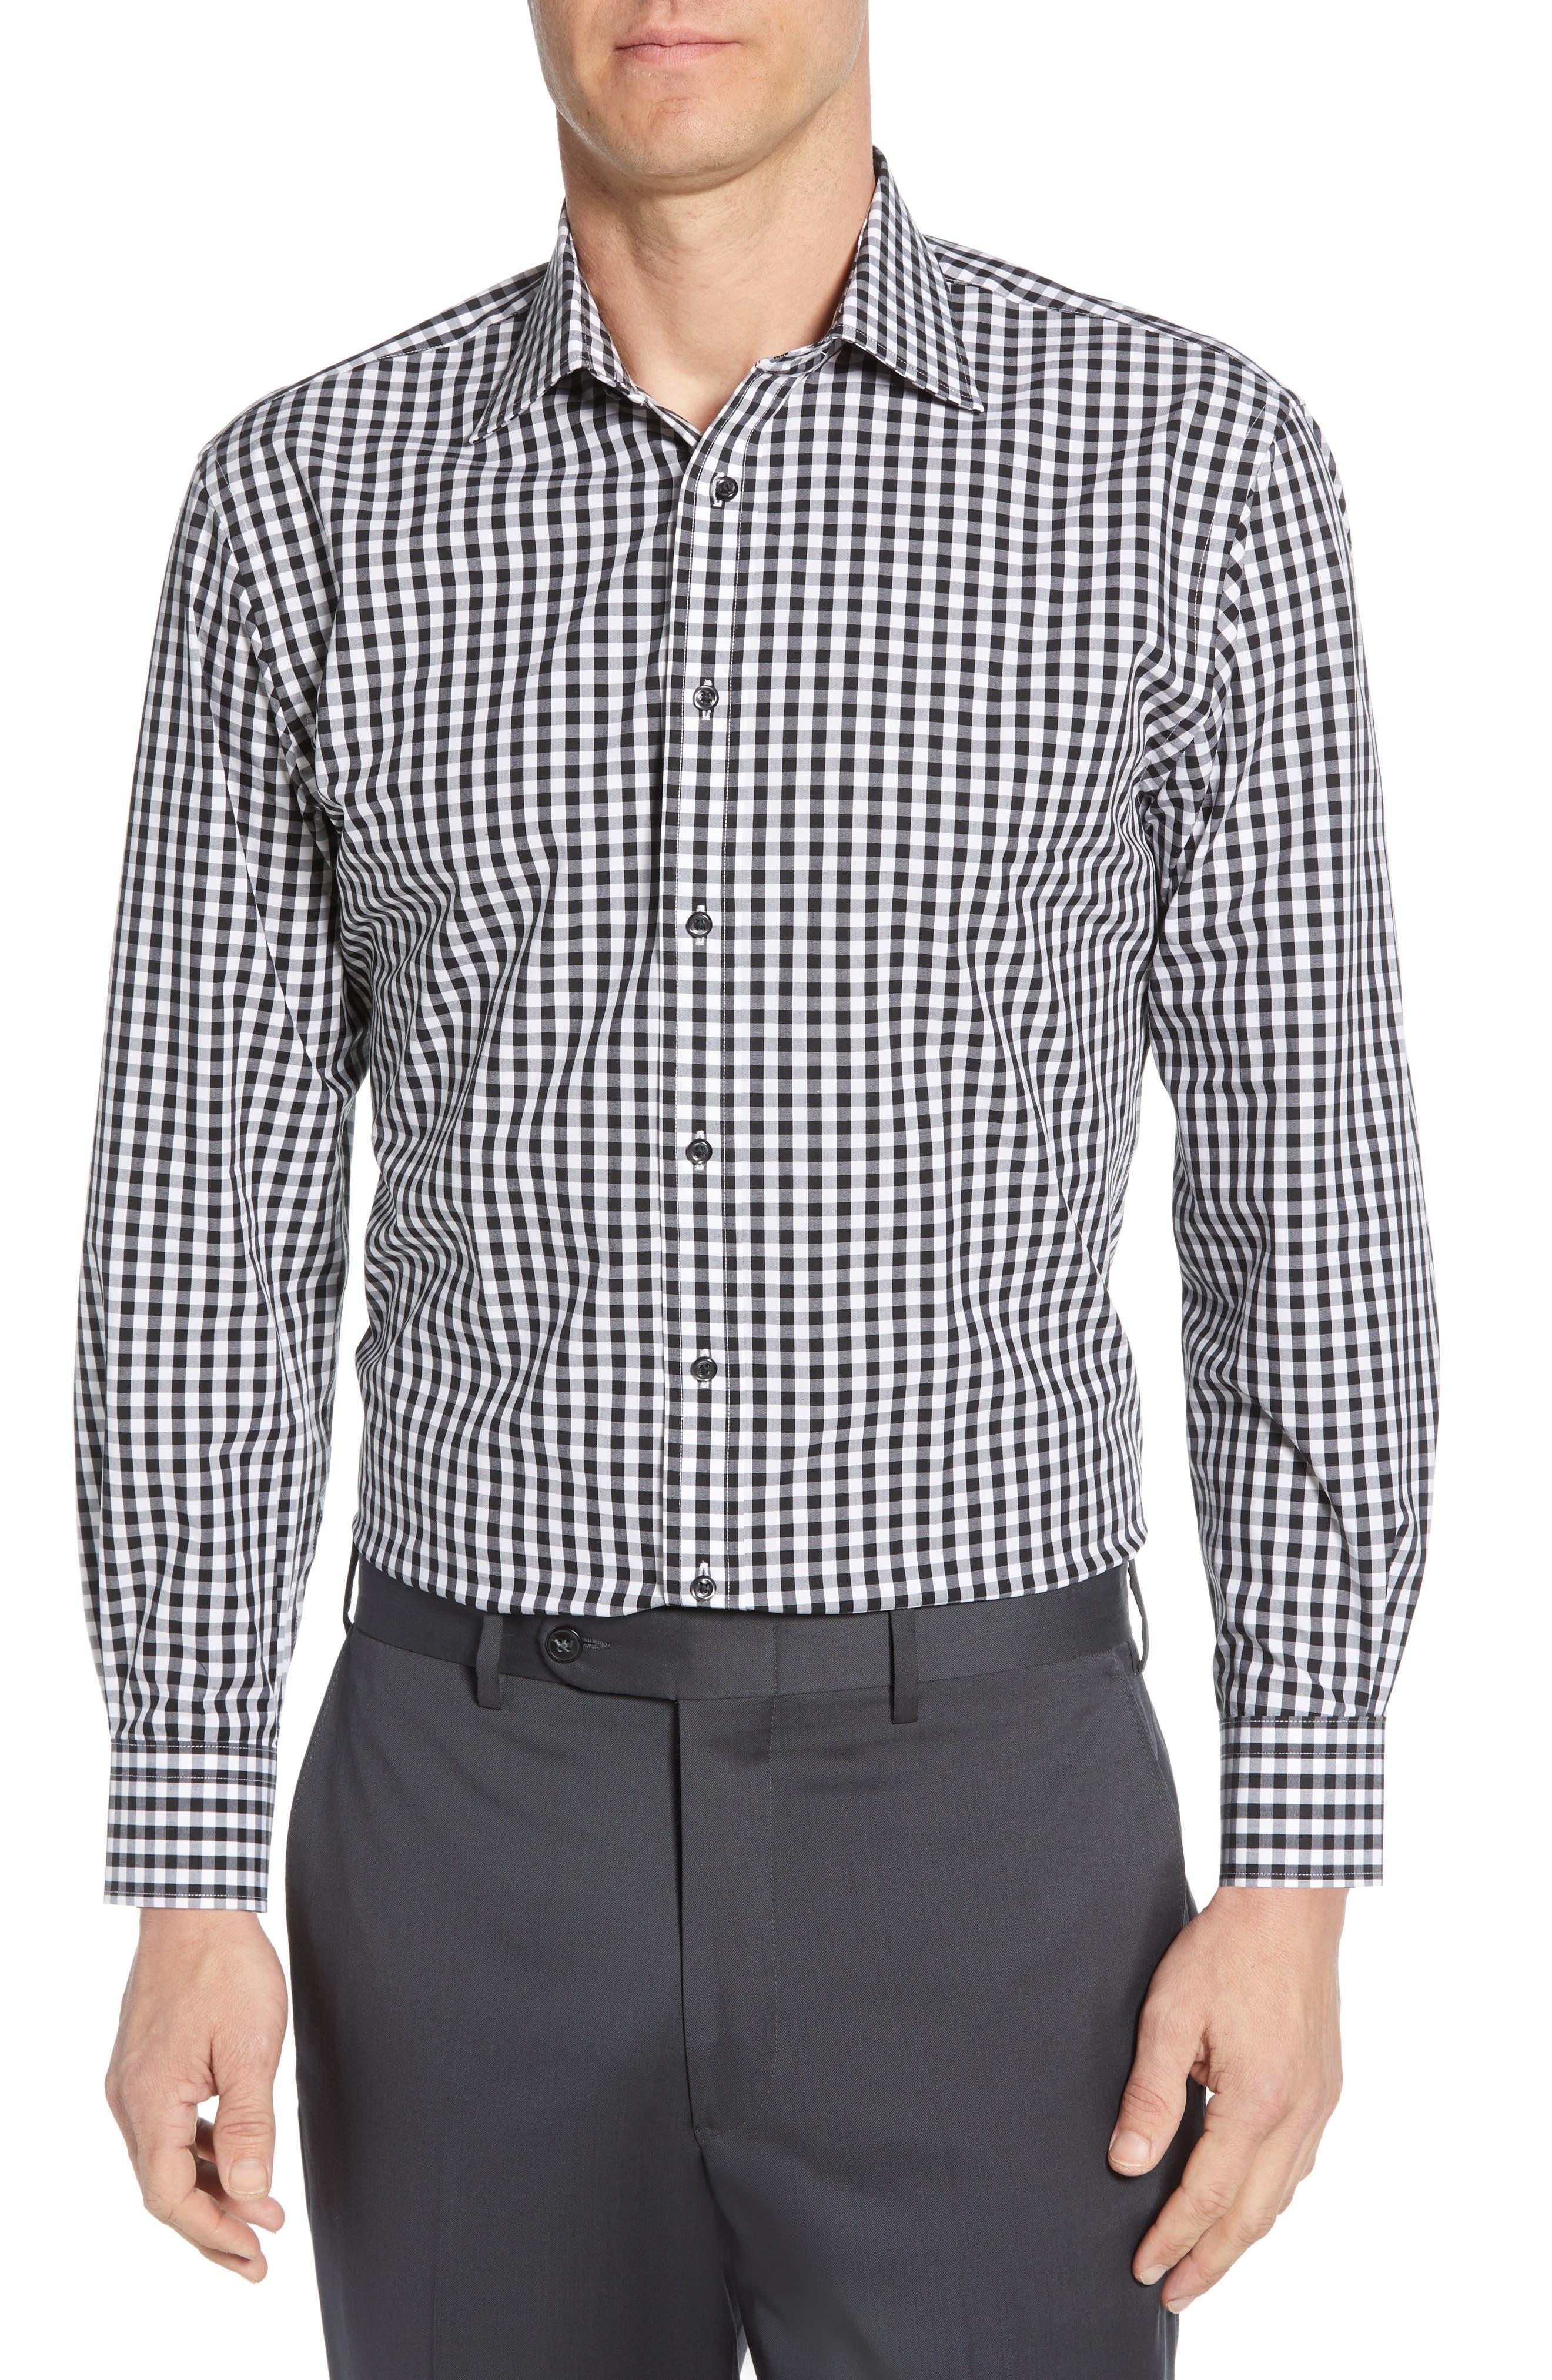 NORDSTROM MEN'S SHOP, Tech-Smart Traditional Fit Stretch Check Dress Shirt, Main thumbnail 1, color, BLACK ROCK